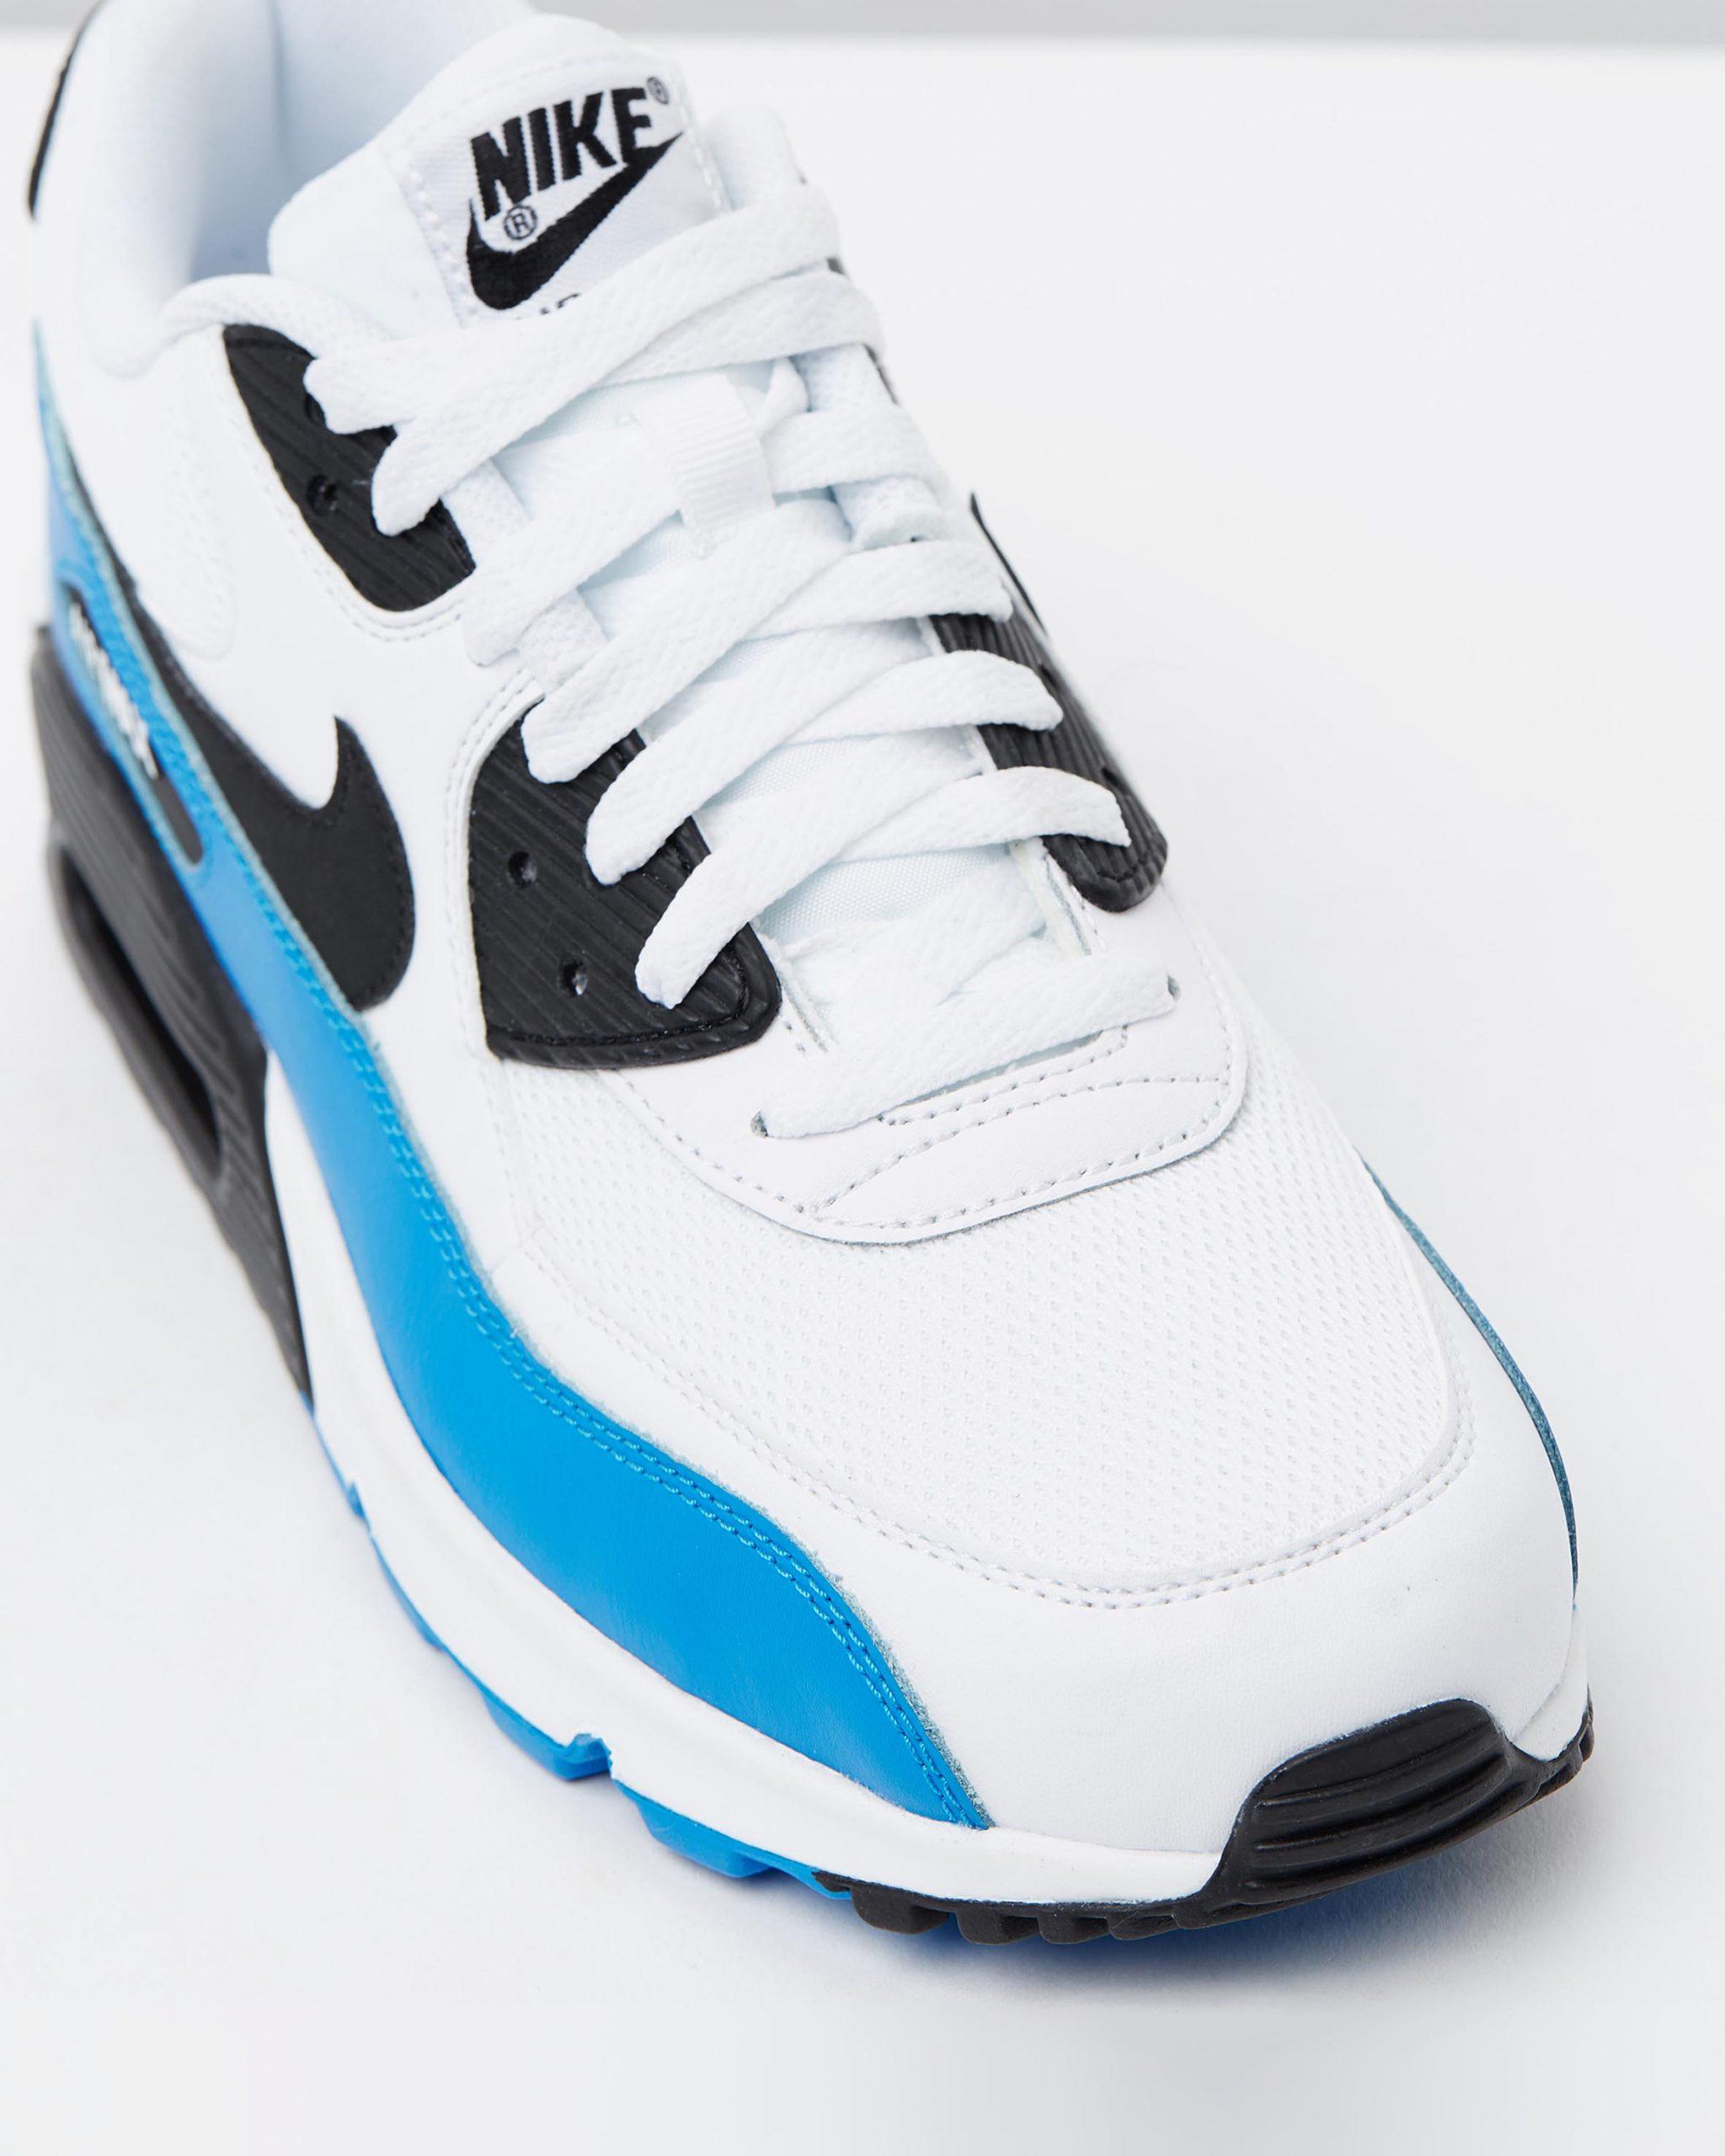 Propuesta alternativa salario negocio  Nike Air Max 90 Essential Black White & Photo Blue | 95Gallery.com